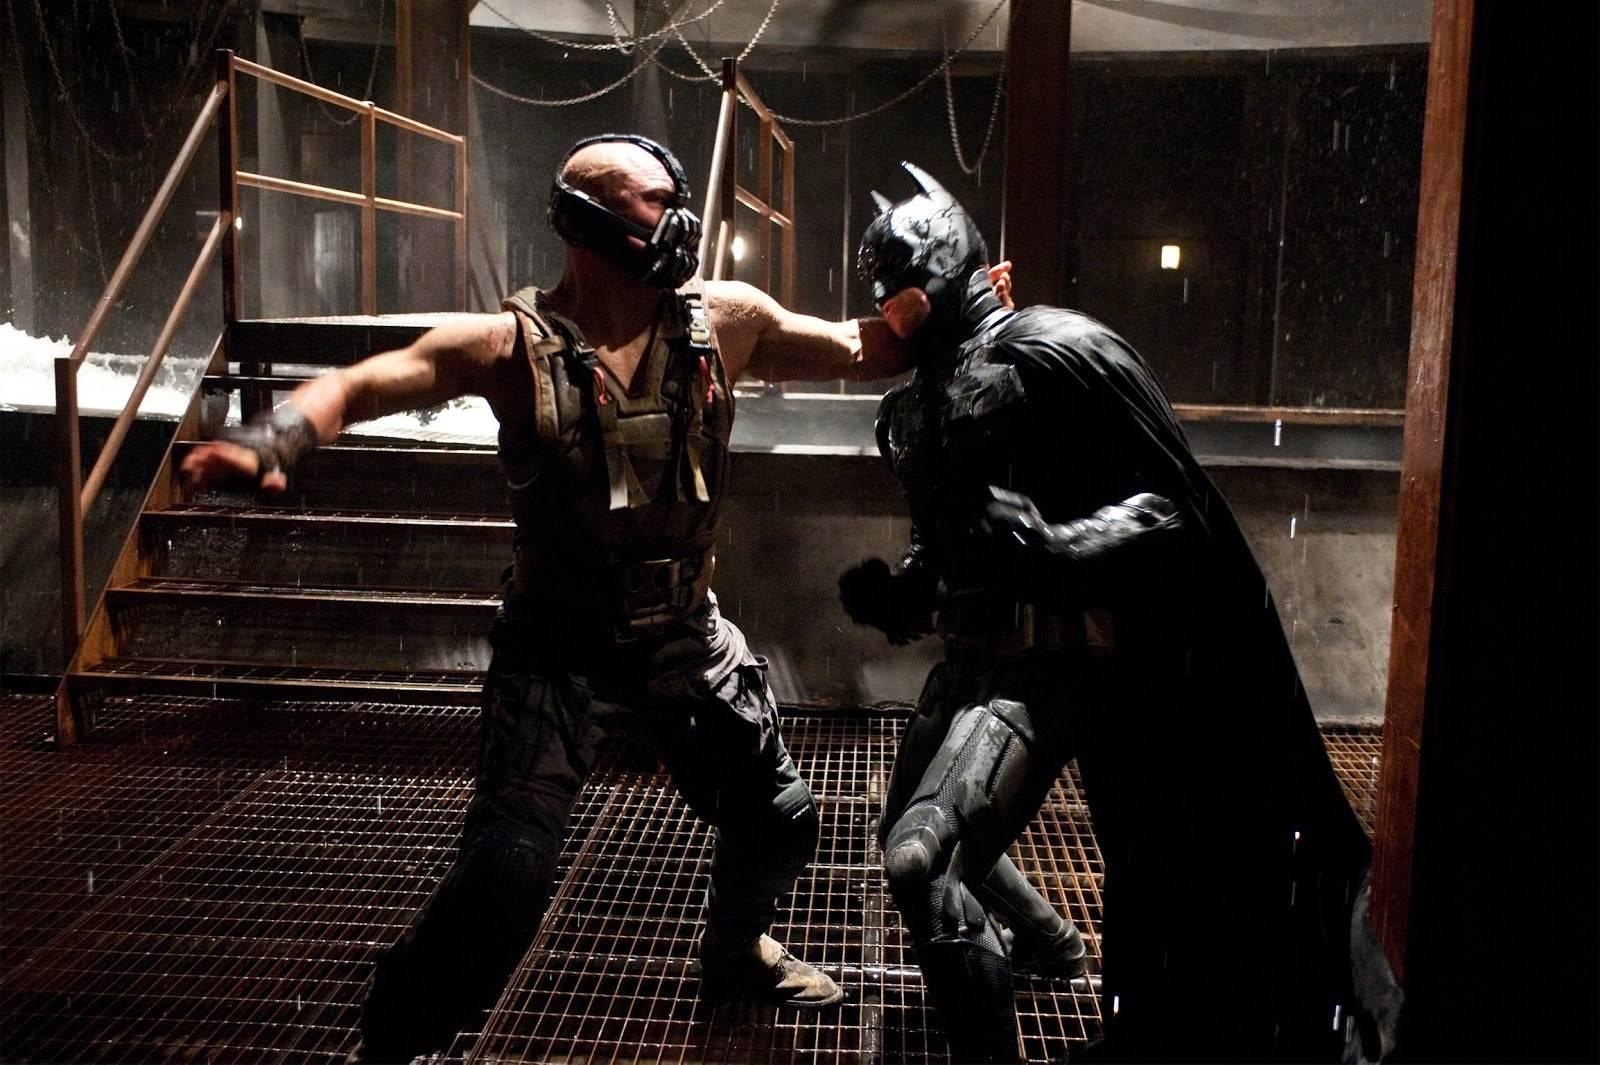 Critical Distance: The Dark Knight Rises